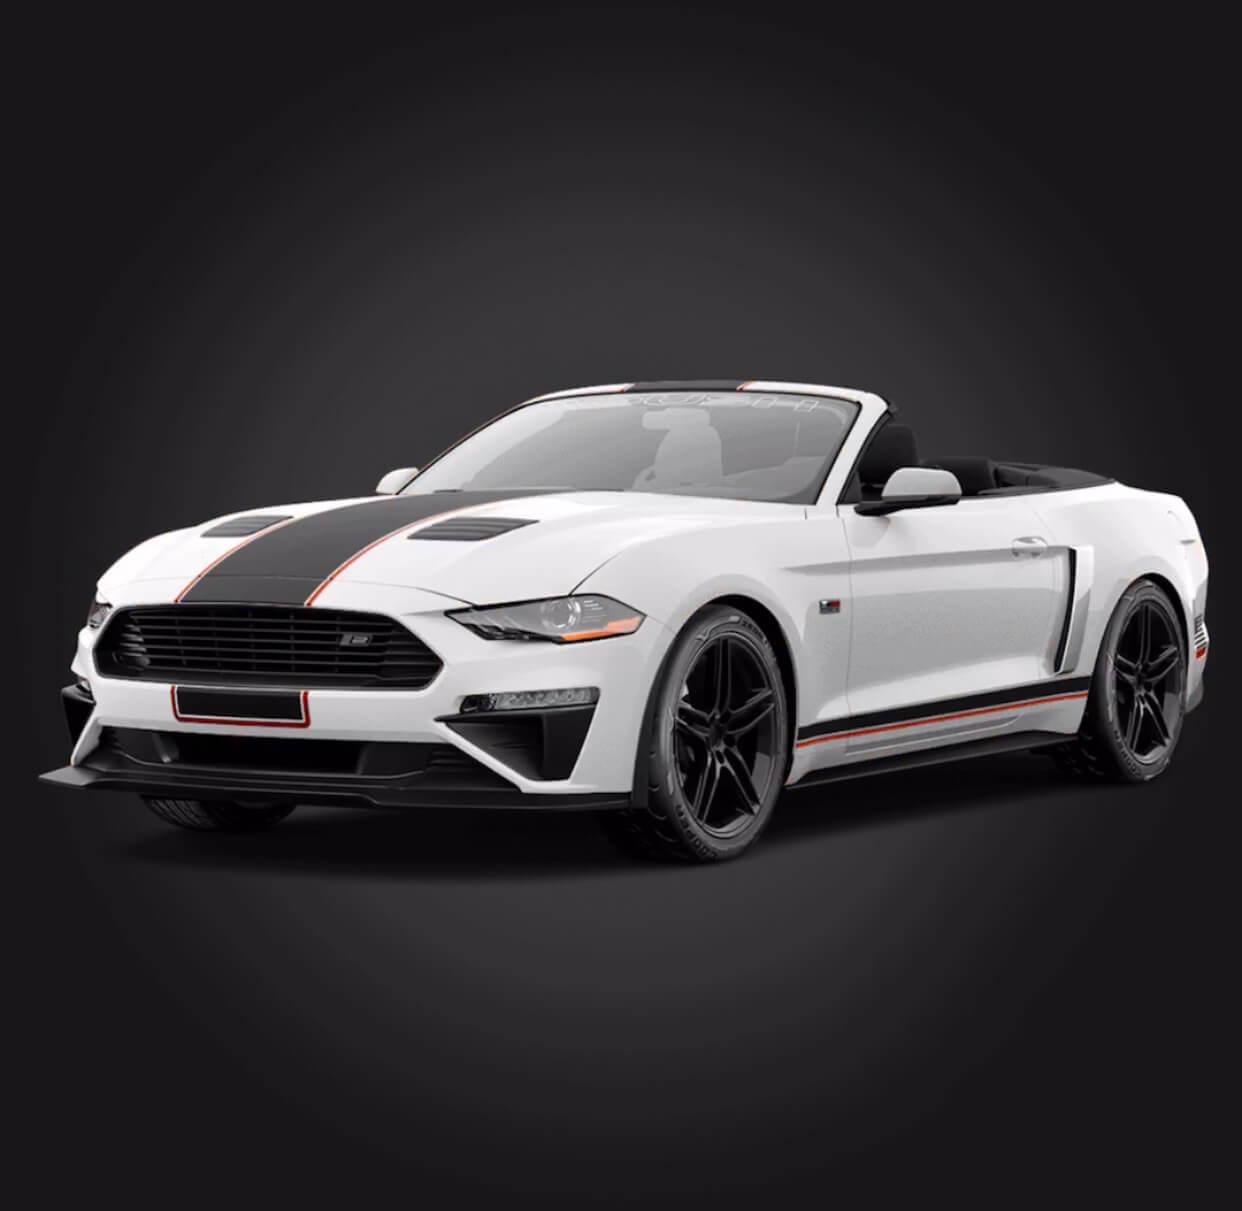 2018 Roush Mustang Sneak Peek